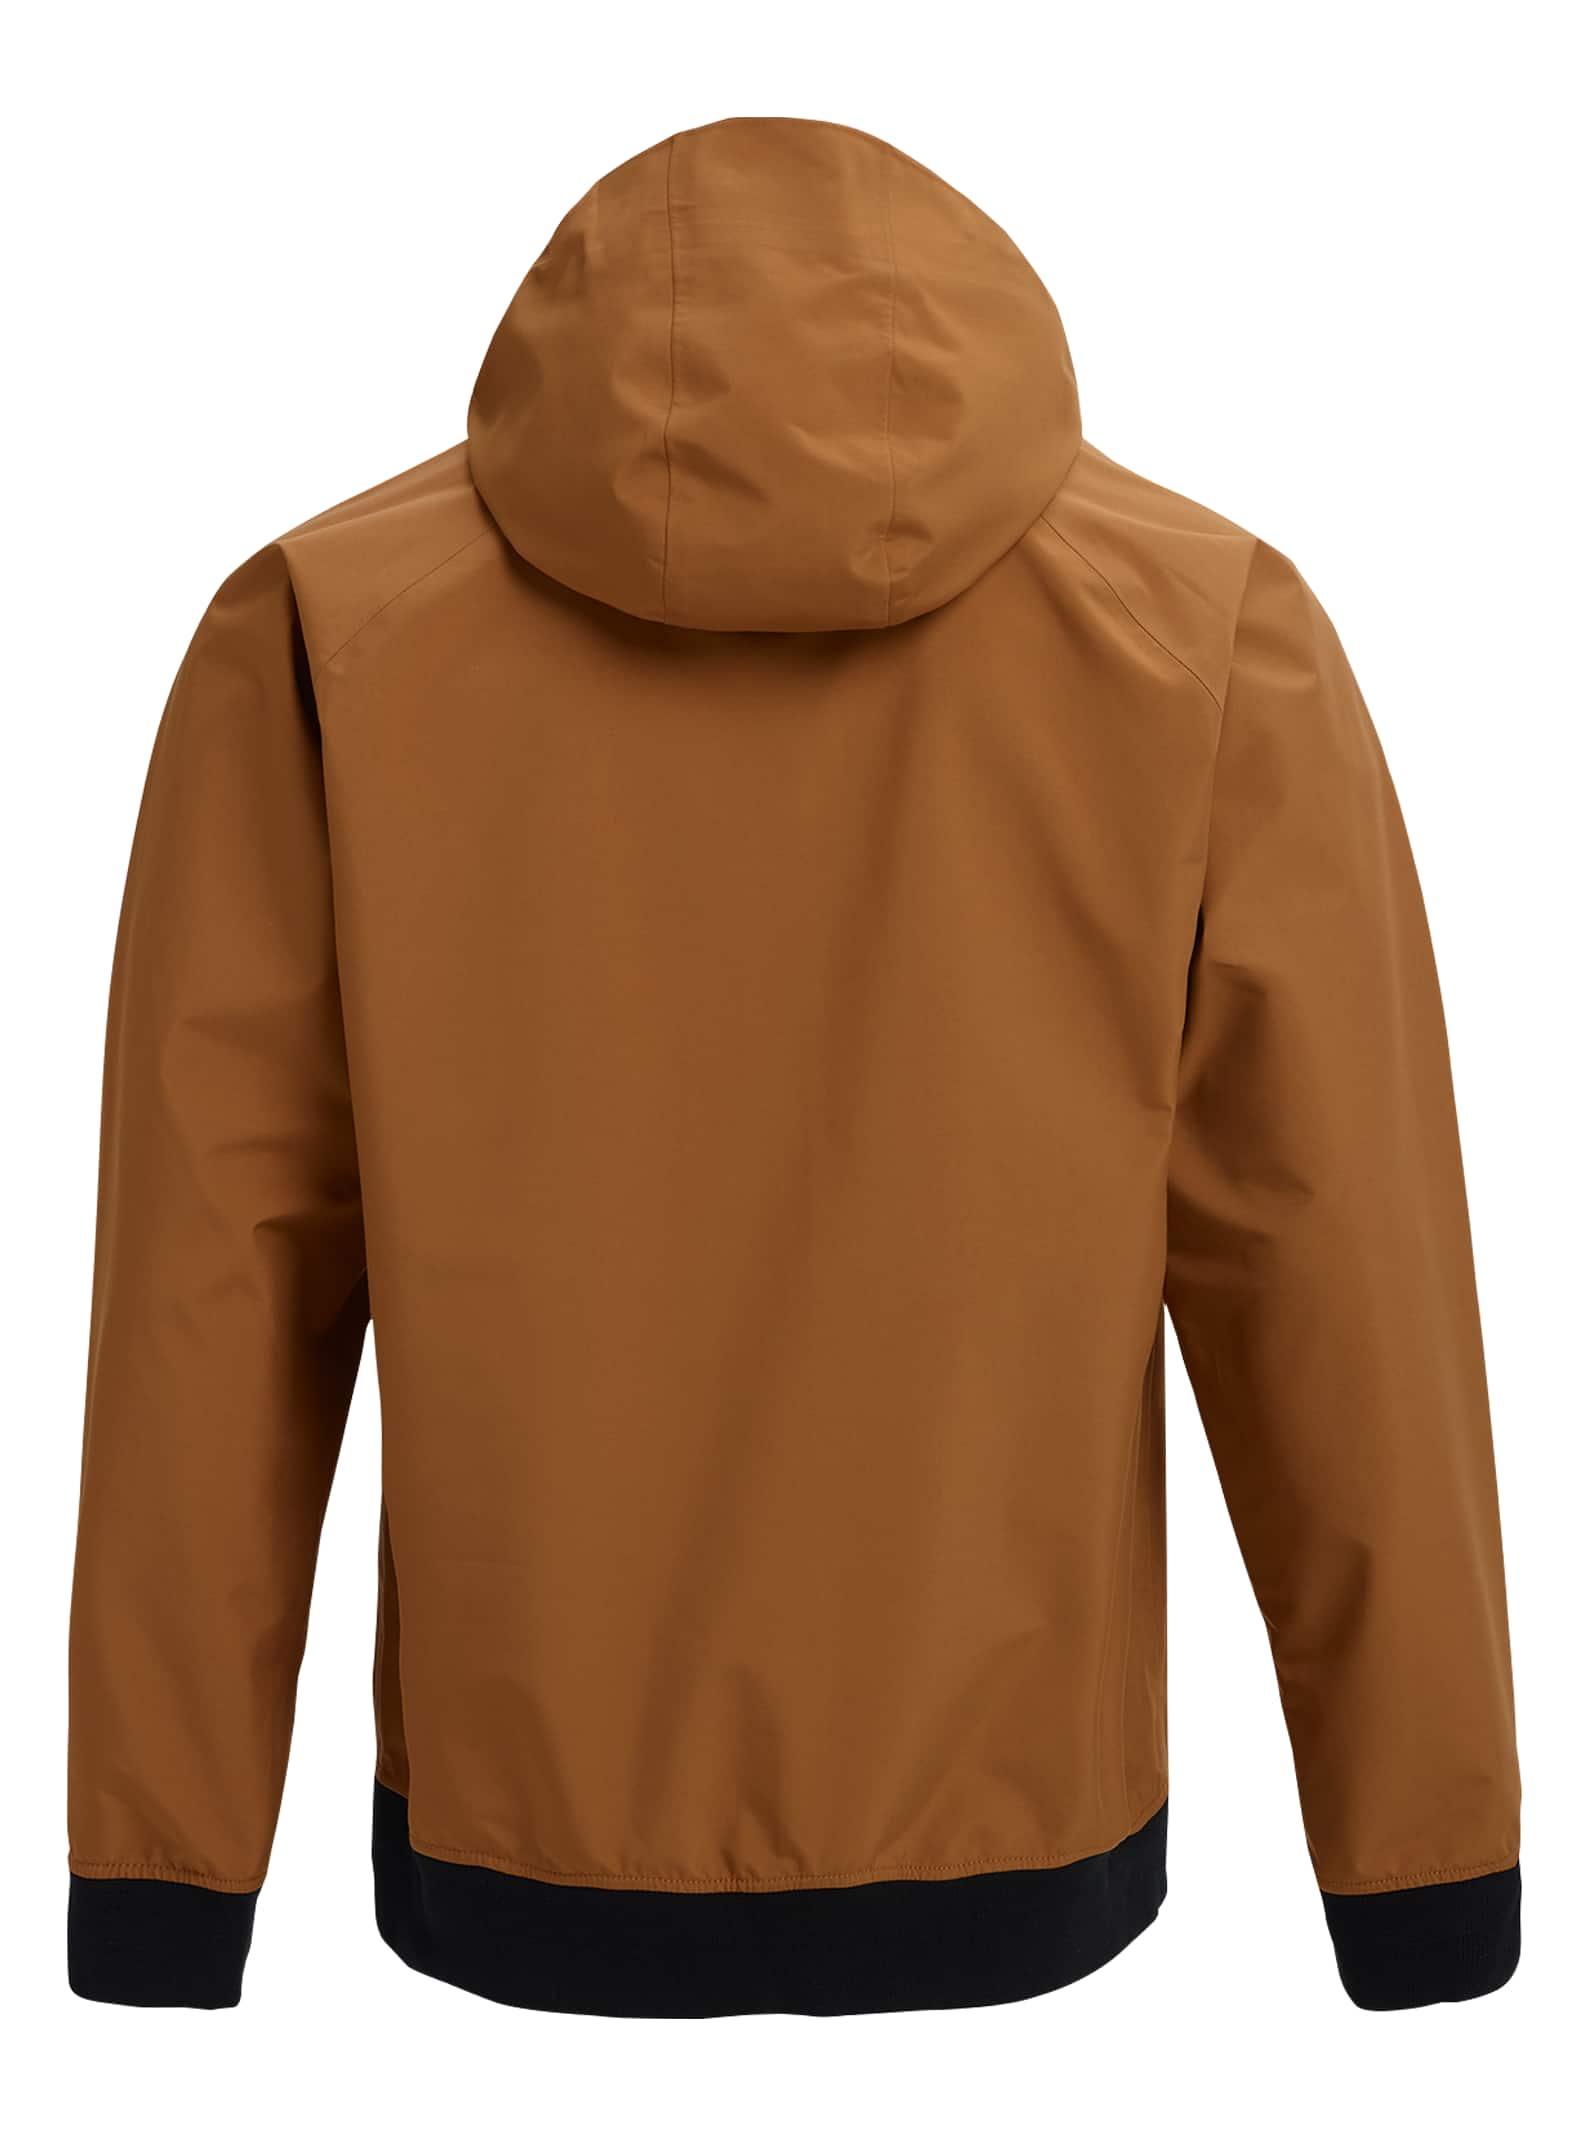 5b6ba033ea Men's Burton x Carhartt WIP Fairburn 3L Car-Lux Hooded Jacket  Burton.com  Fall 2019Burton x Carhartt WIP